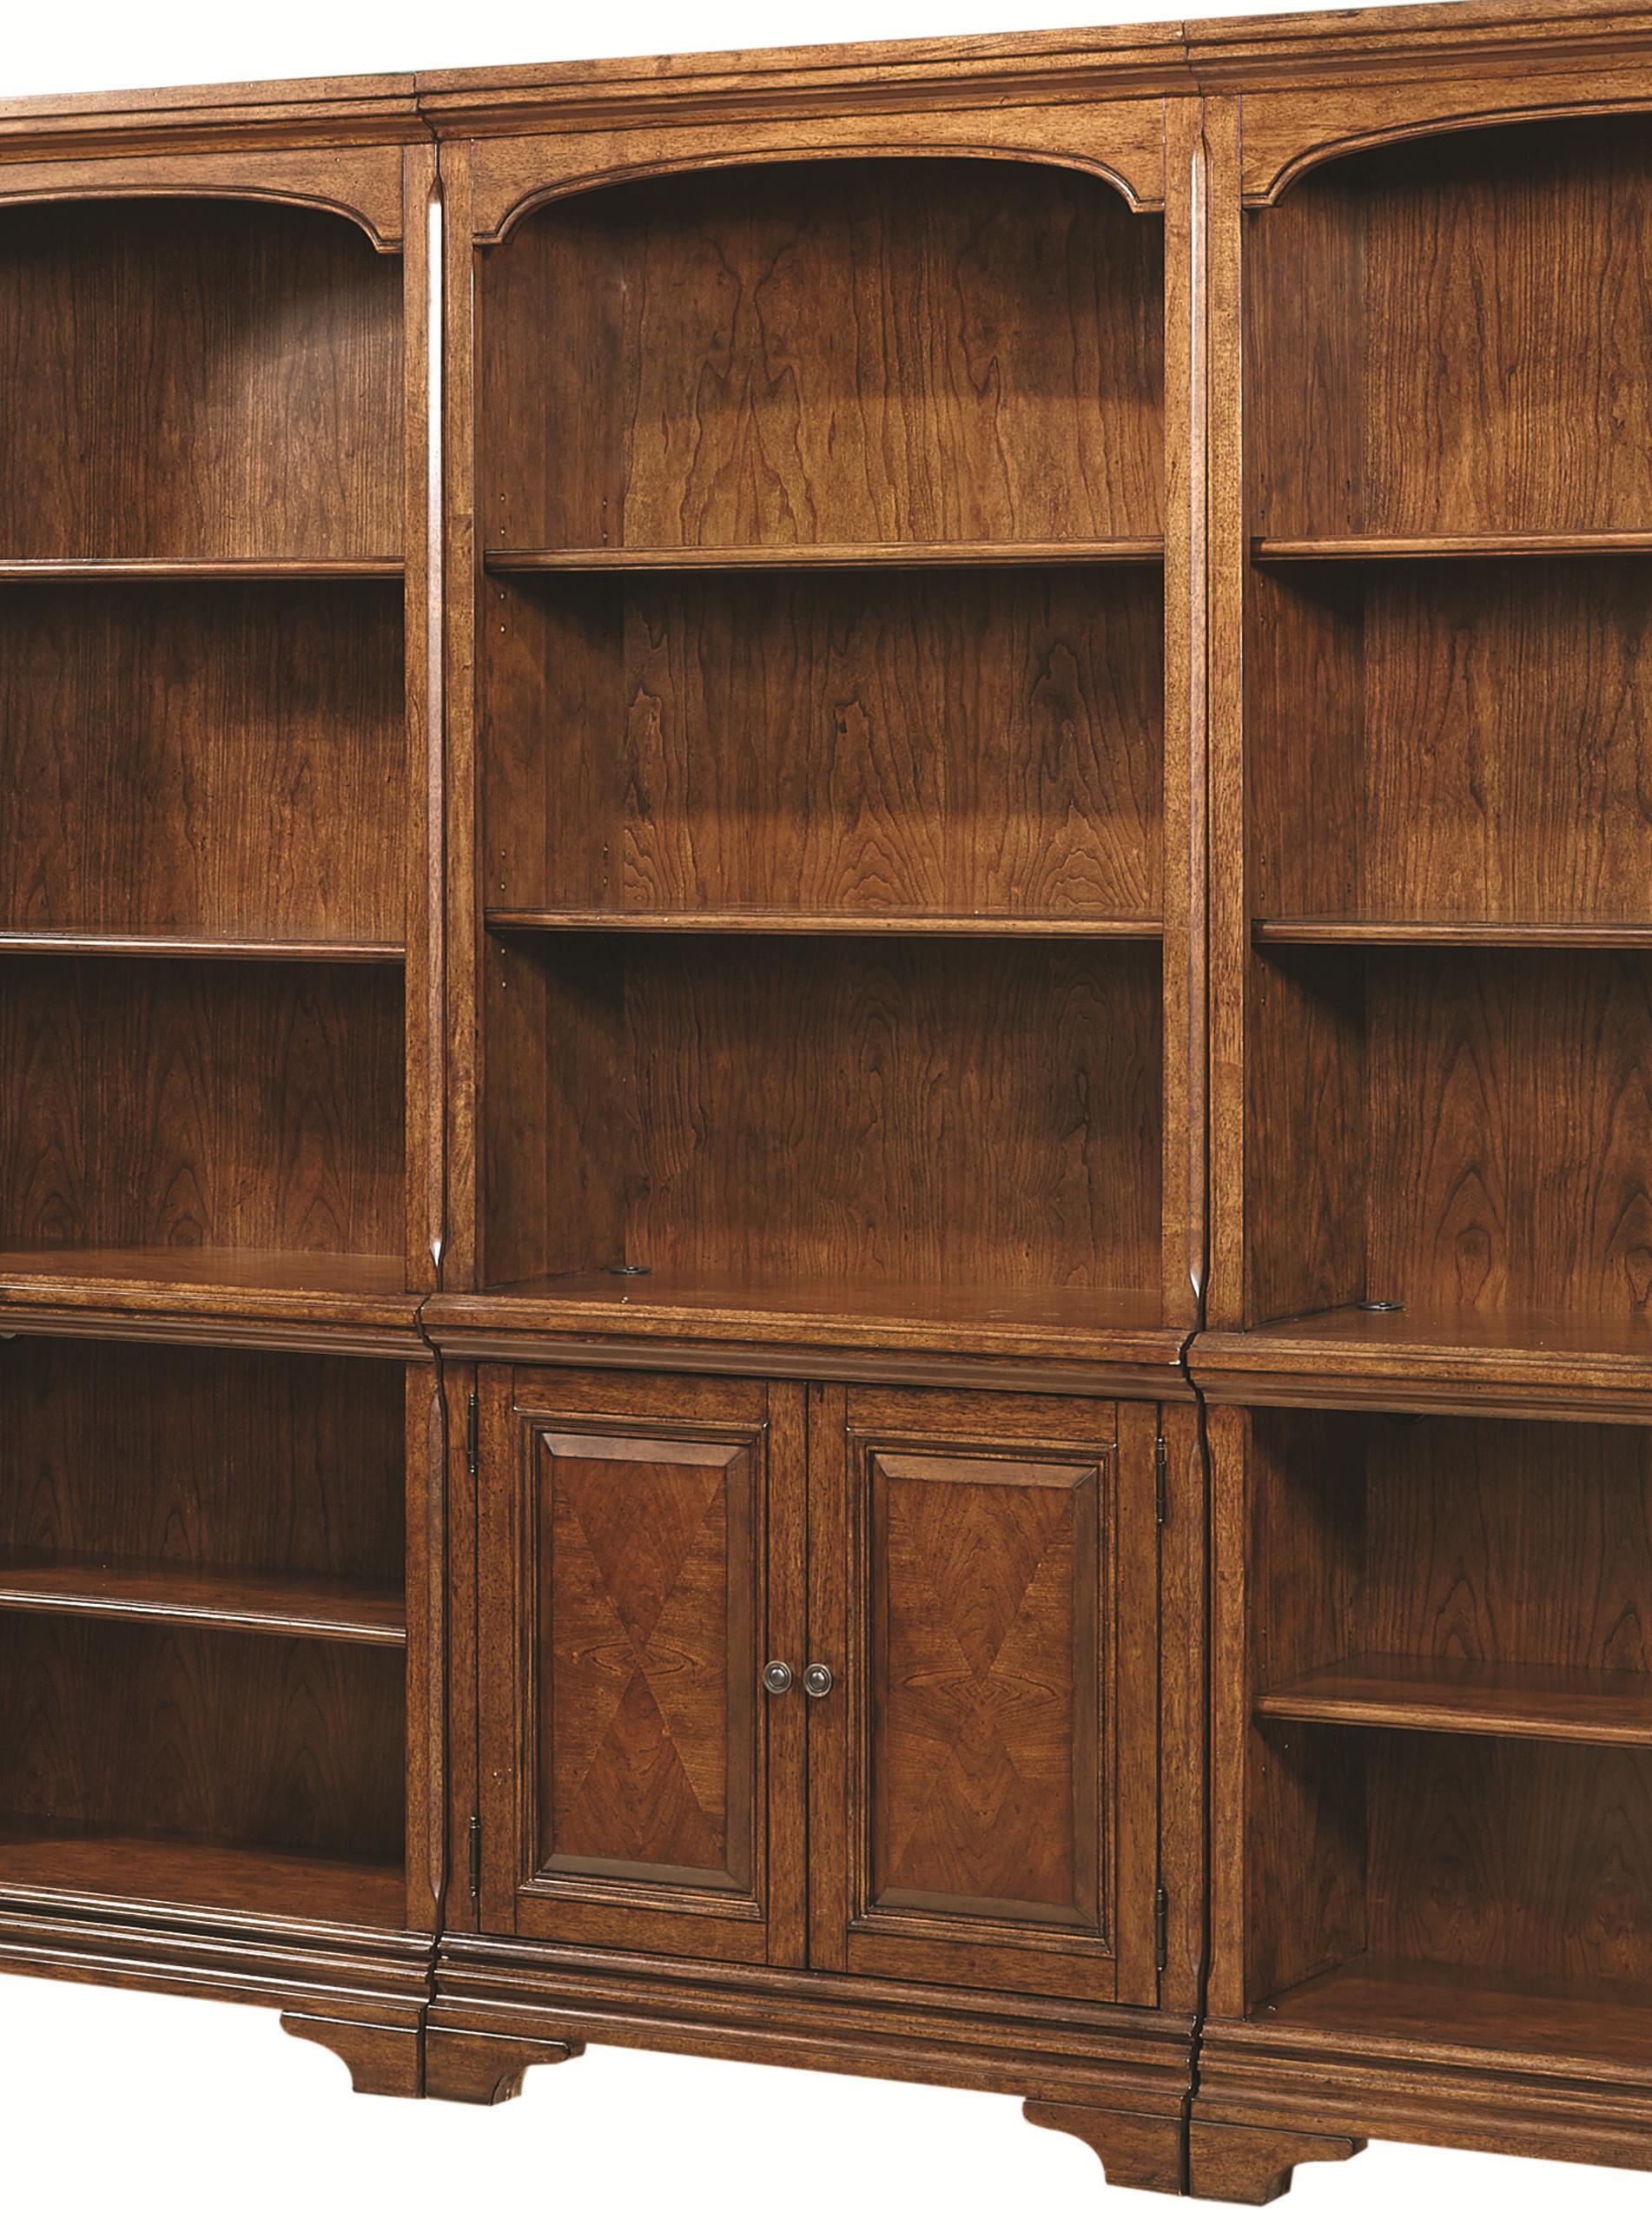 Hawthorne Door Bookcase by Aspenhome at Mueller Furniture